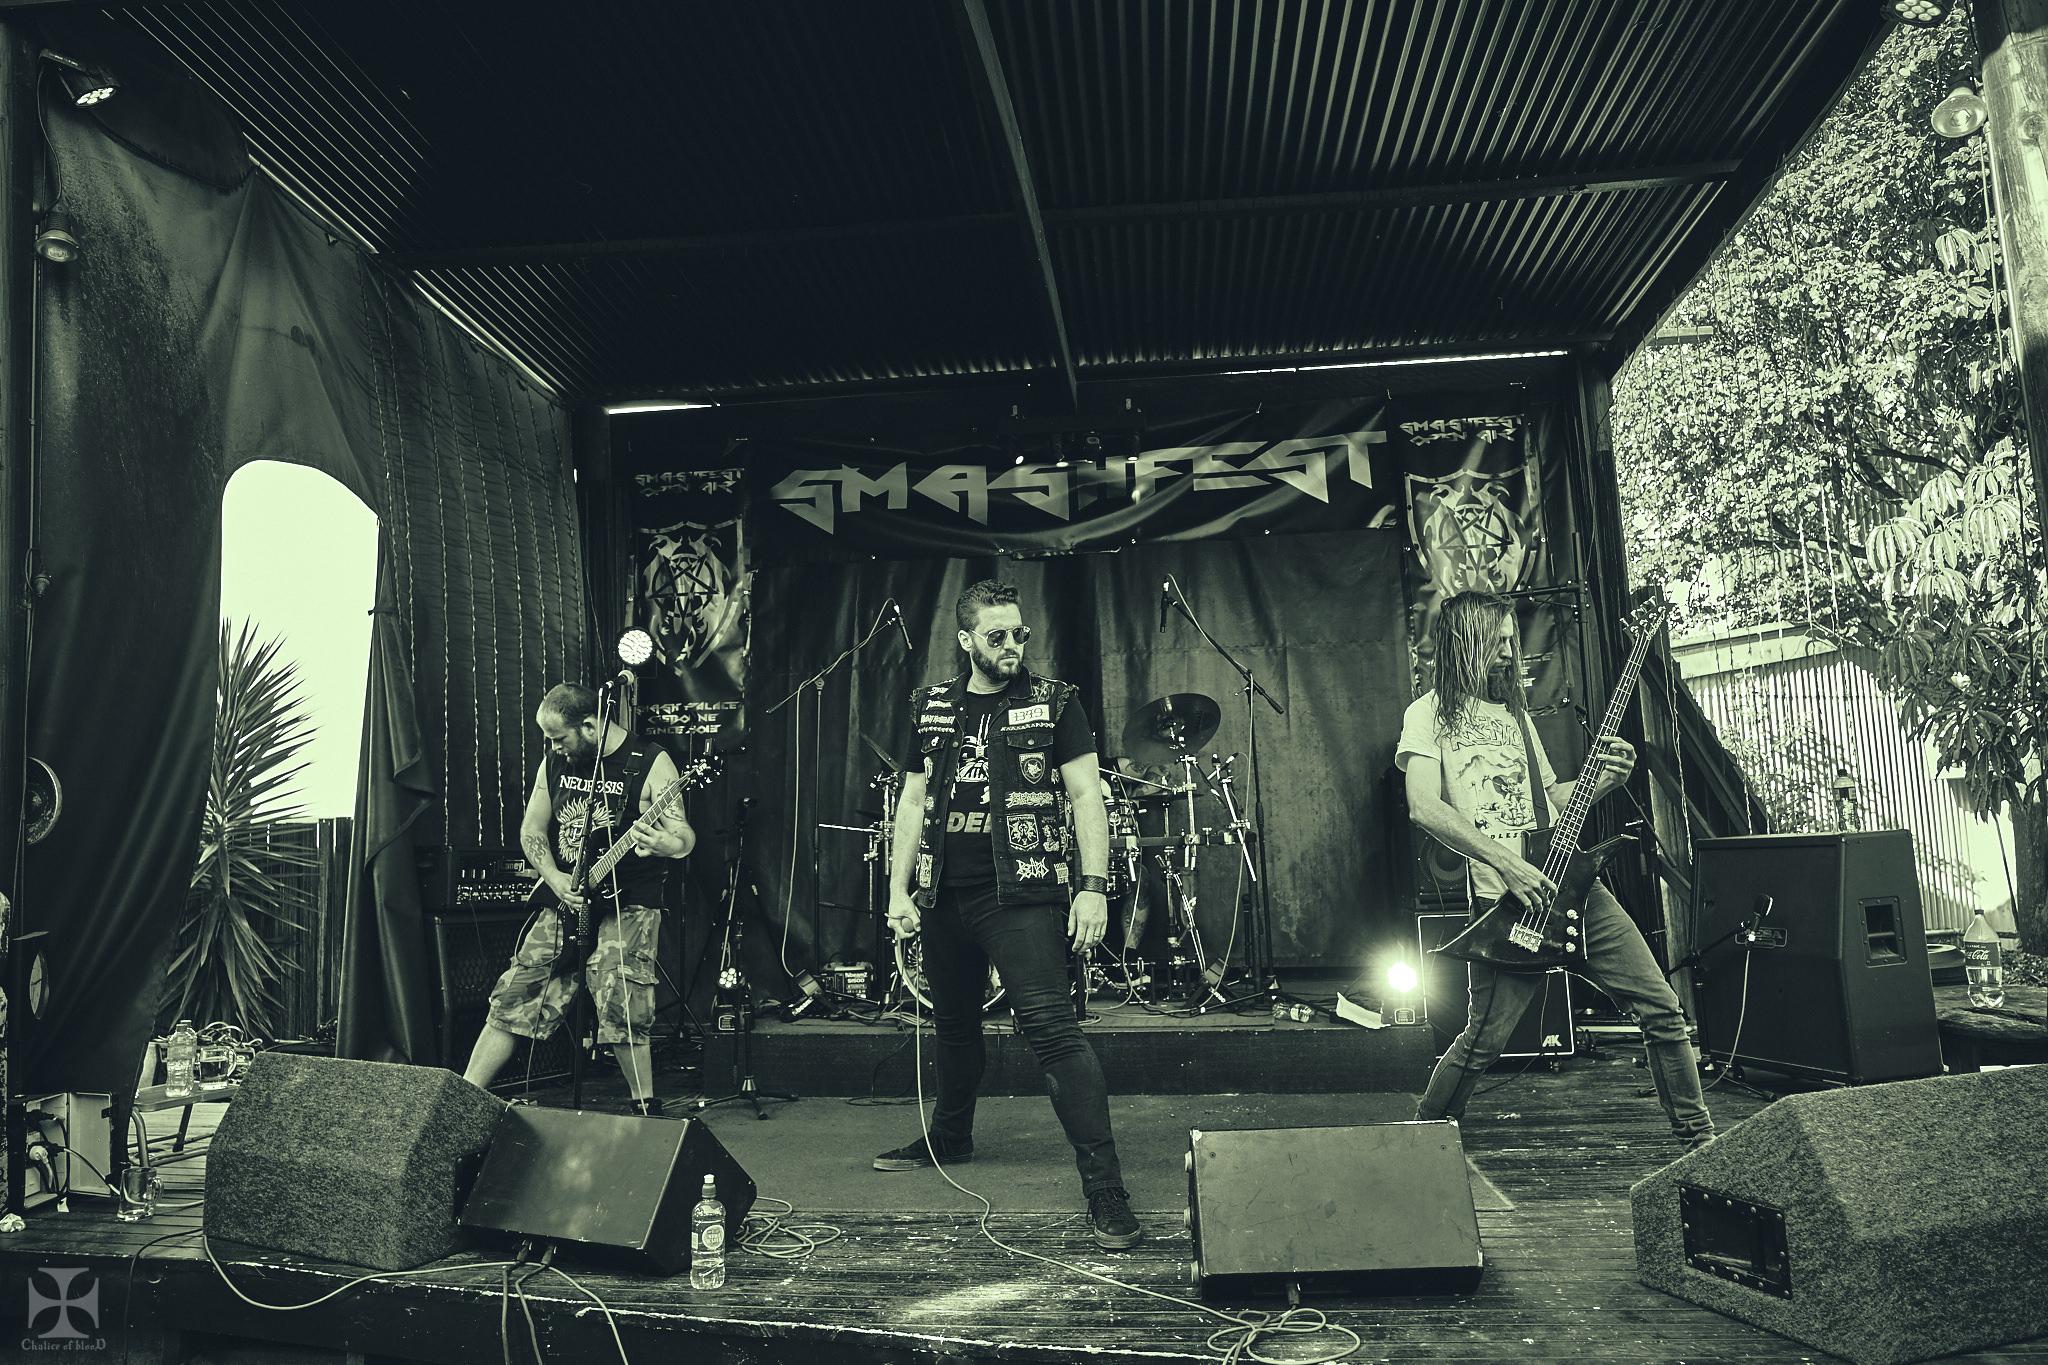 Smash Fest 2019 - SmashFest VII- Extinction Campaign - 0136.jpg